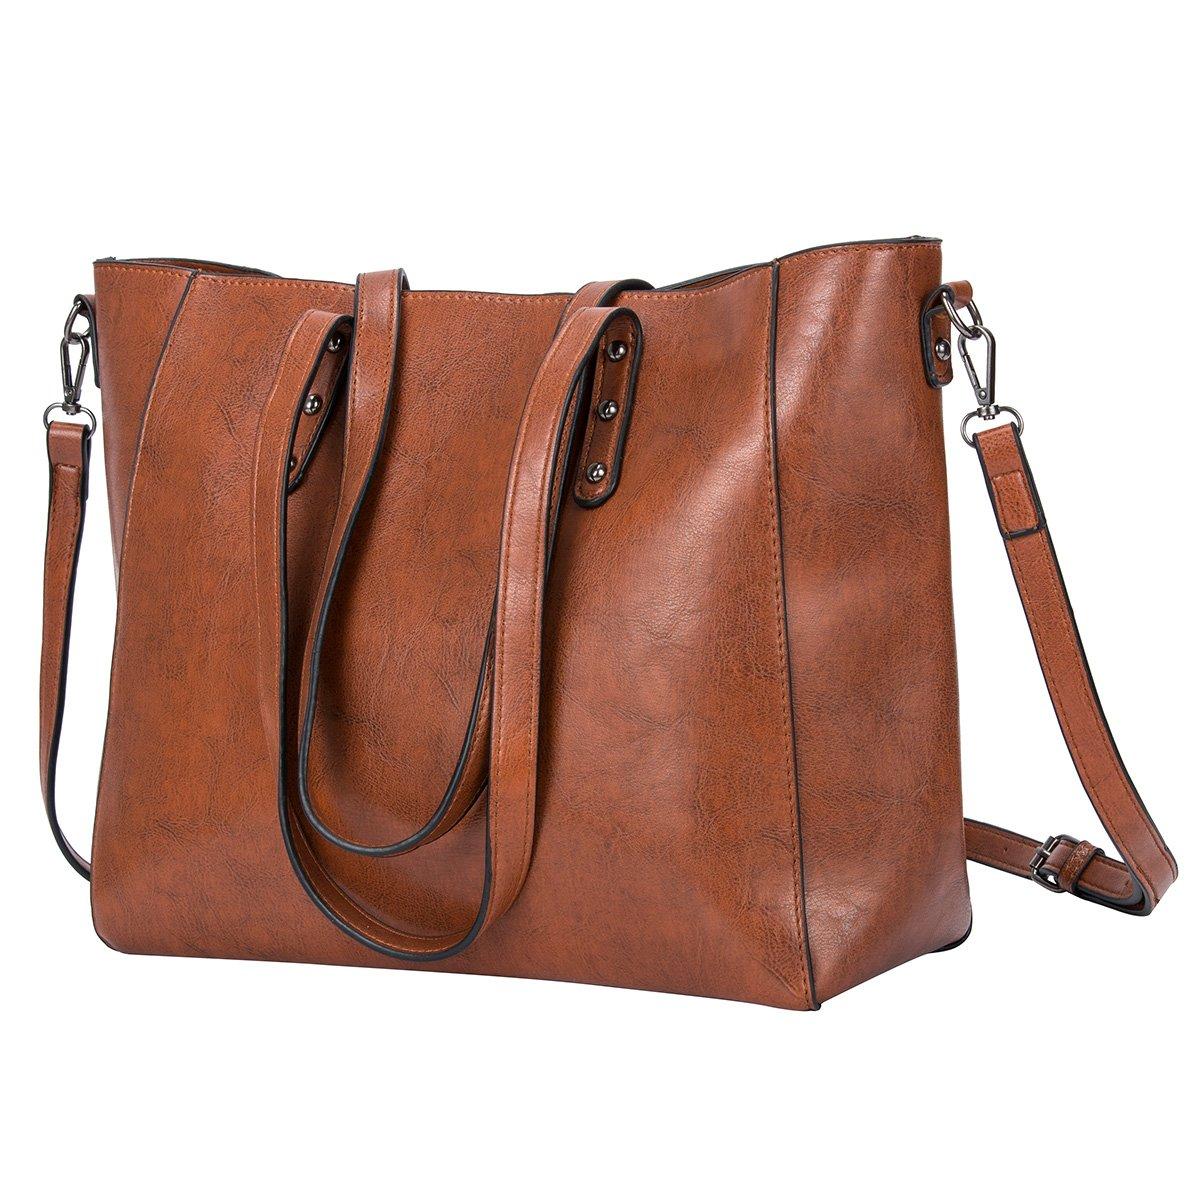 Women Top Handle Satchel Handbags Shoulder Bags Tote Purse  Handbags   Amazon.com 00201a485ffa4